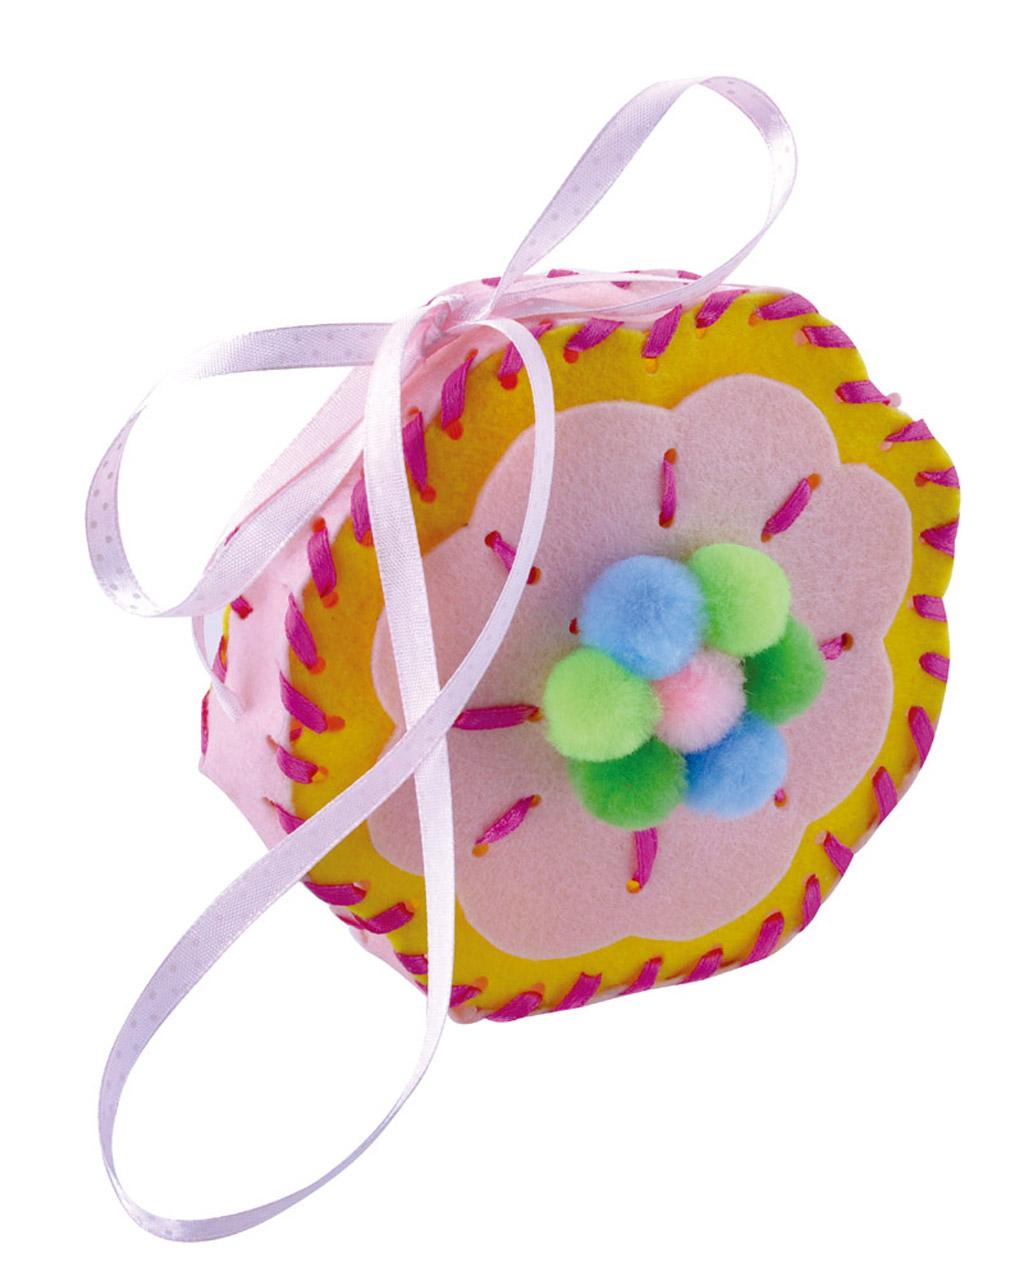 DIY Felt Fabric Bag DIY Craft Kits for Kids Children - Flower Shaped Bag